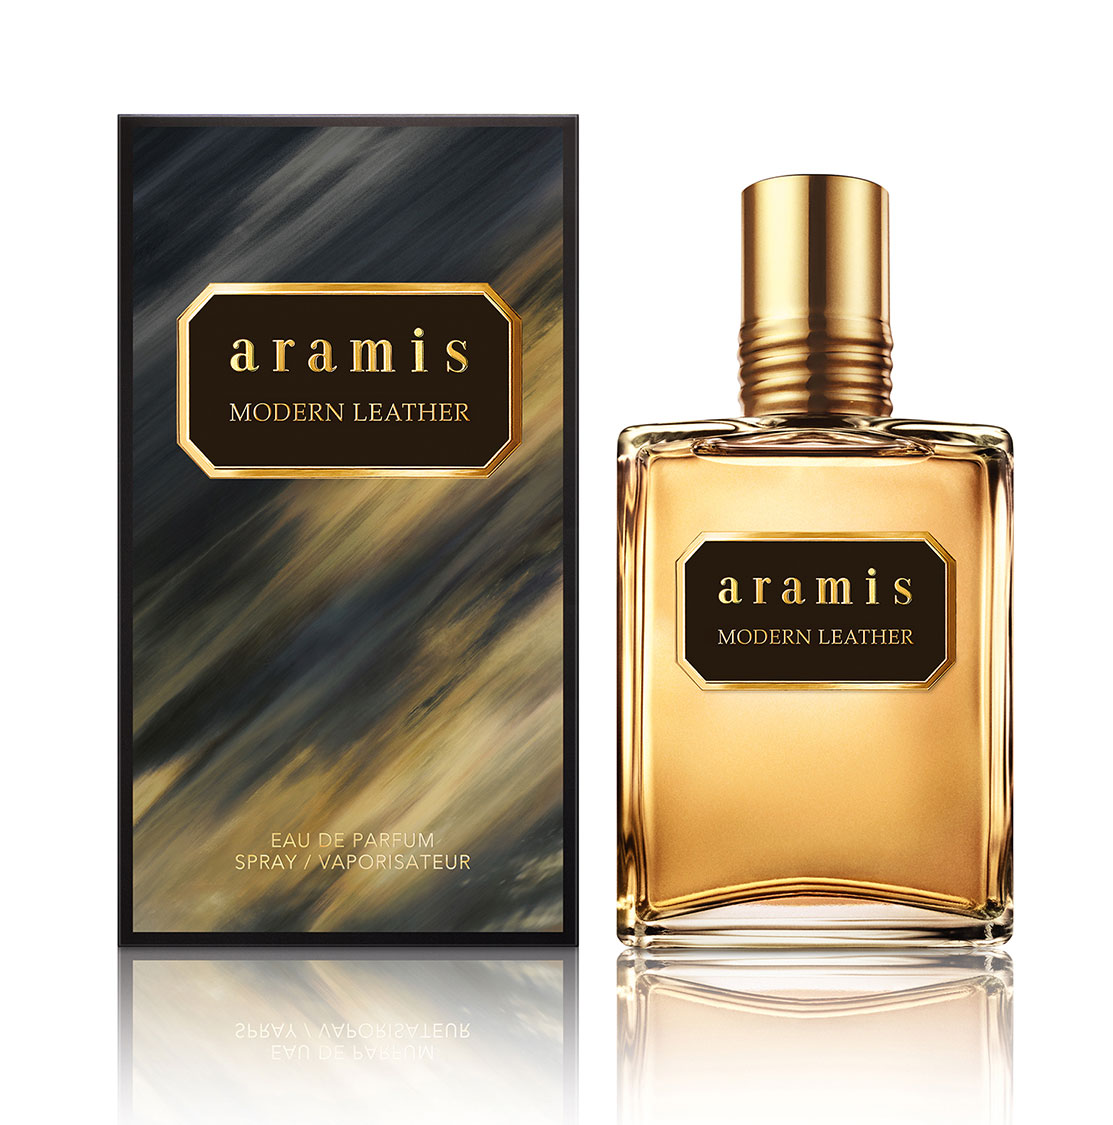 Aramis Modern Leather Aramis одеколон новый аромат для мужчин 2017